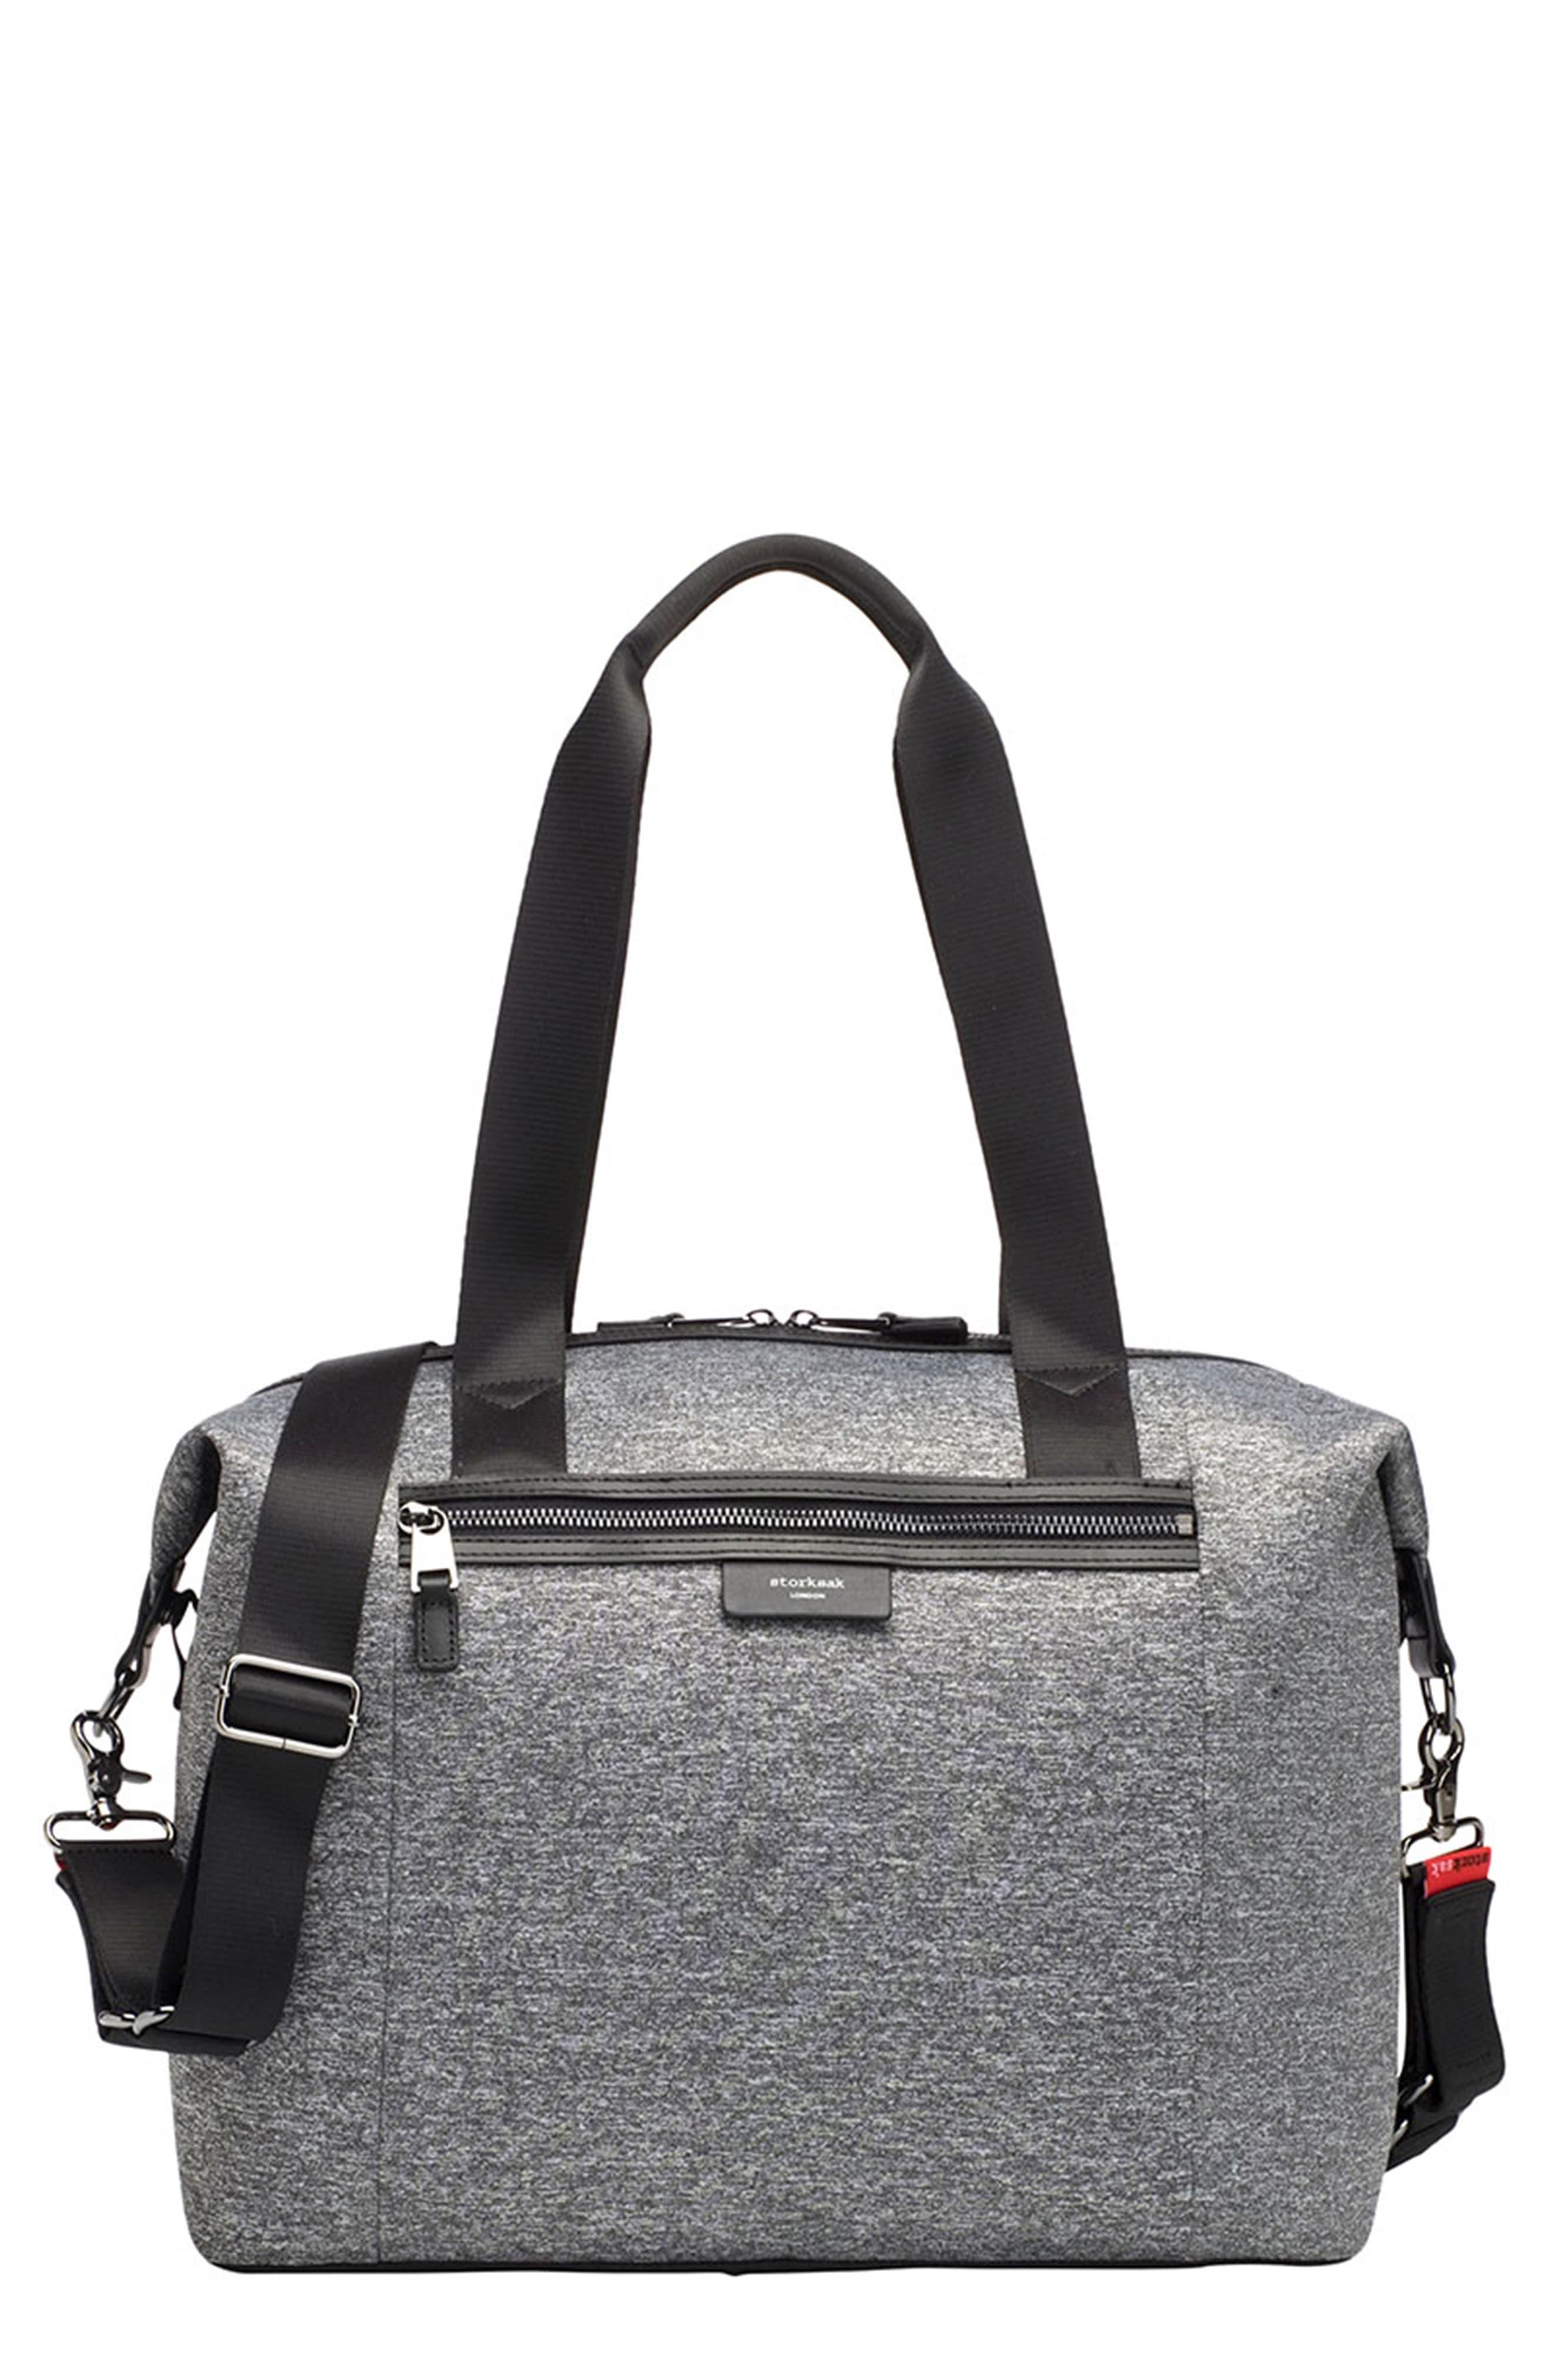 Infant Storksak Stevie Luxe Diaper Bag  Grey